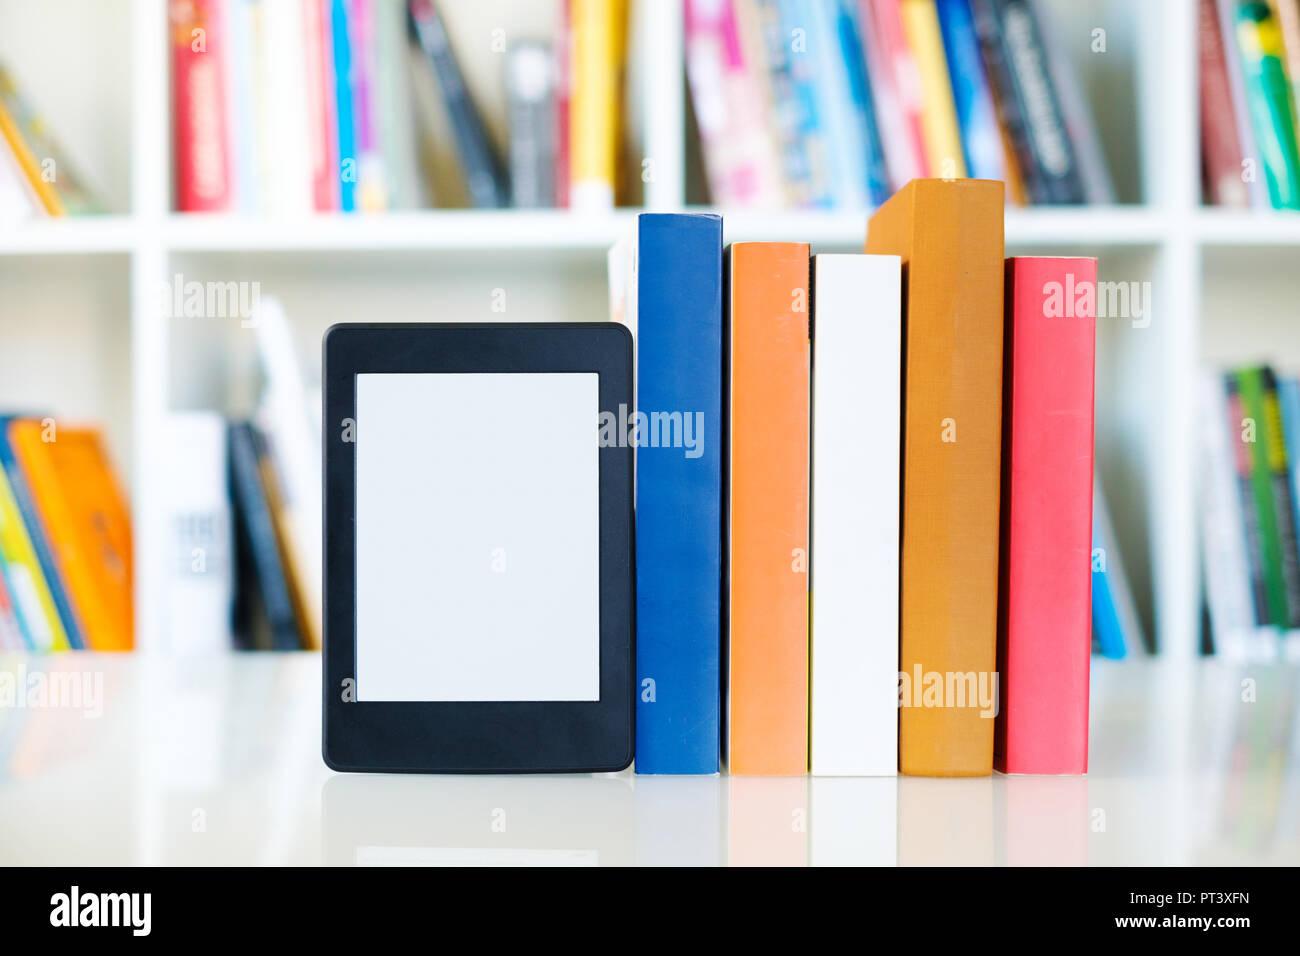 Ebook Reader And Paper Books On Bookshelf BackgroundCopy Space Digital Tablet Display